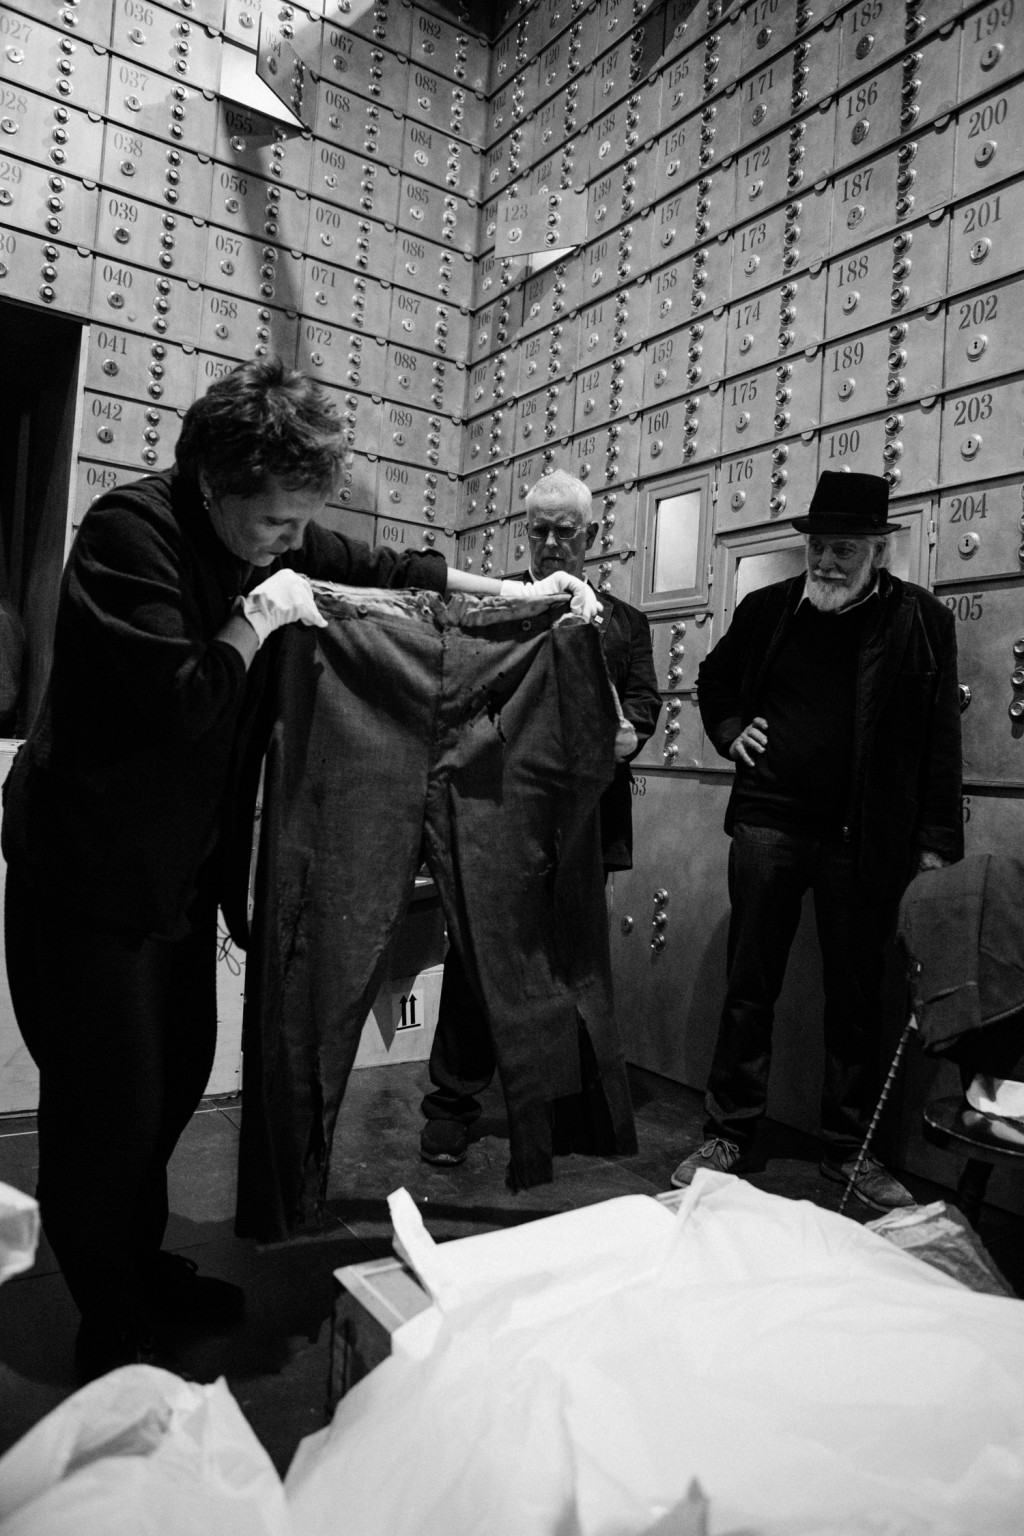 Chaplin's World, Corsier-s-Vevey, Switzerland, (c) 2016-Marc Ducrest  for Chaplin's World